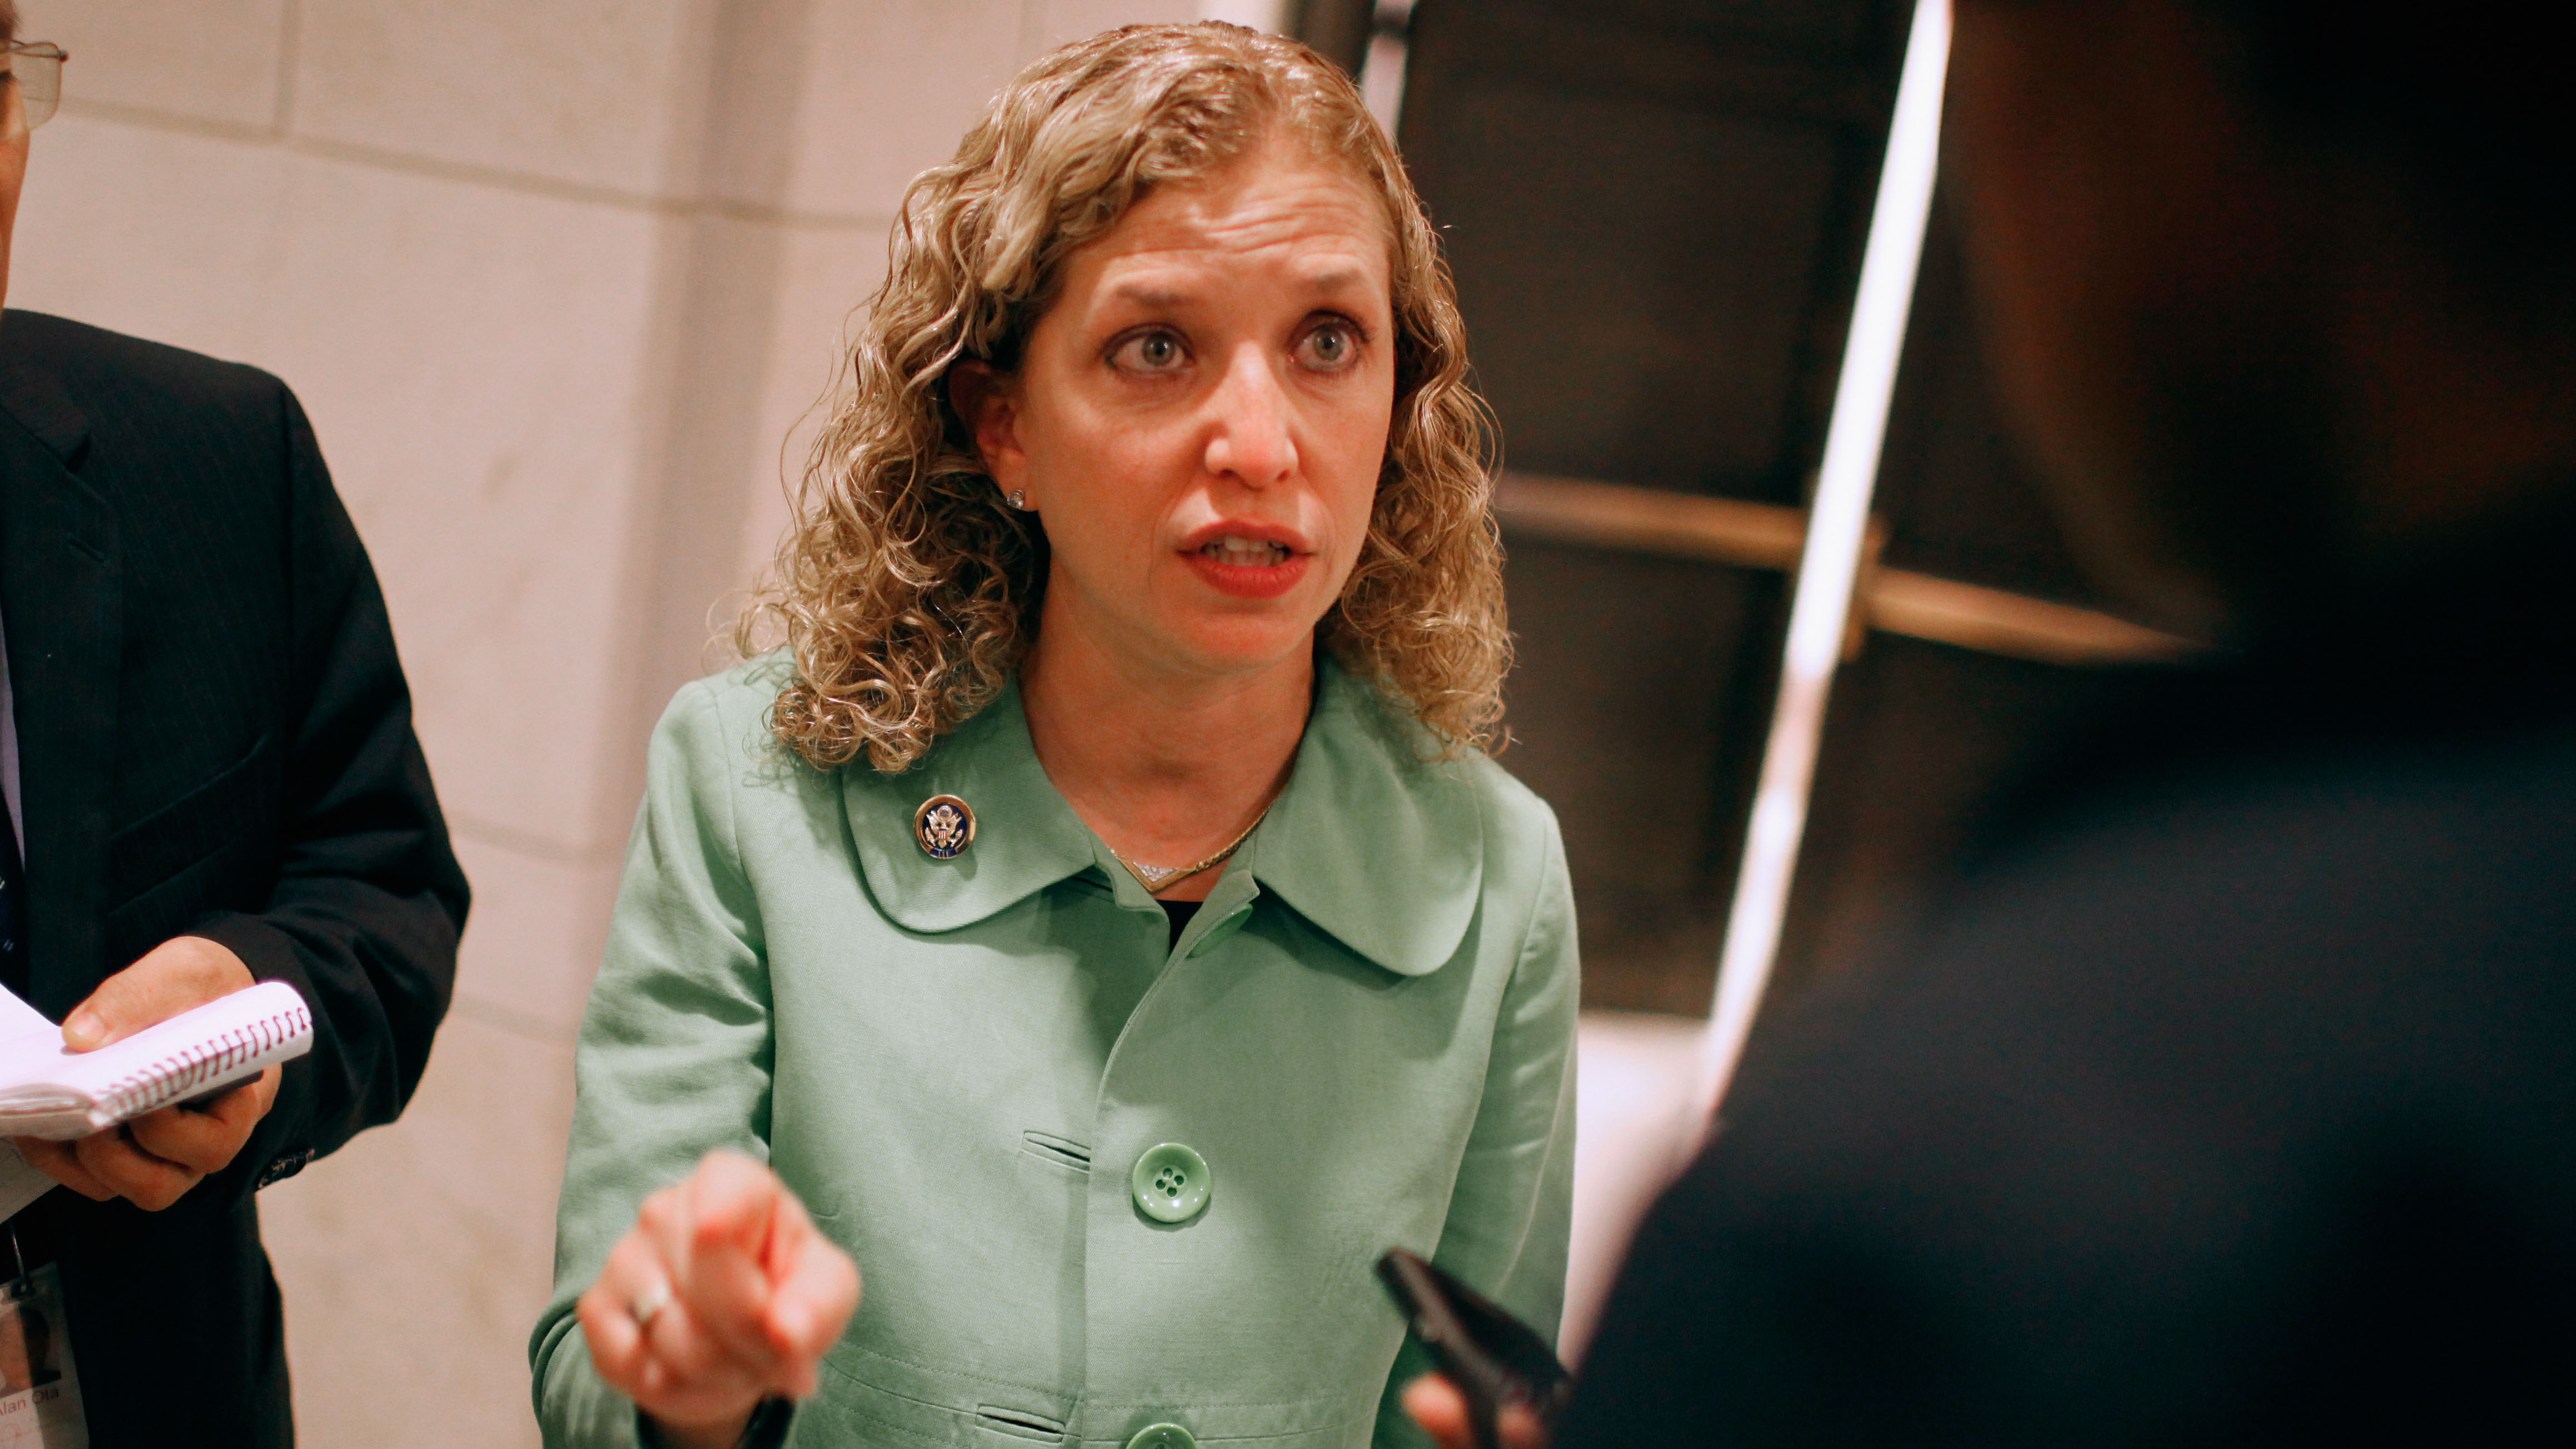 brainless democrat woman